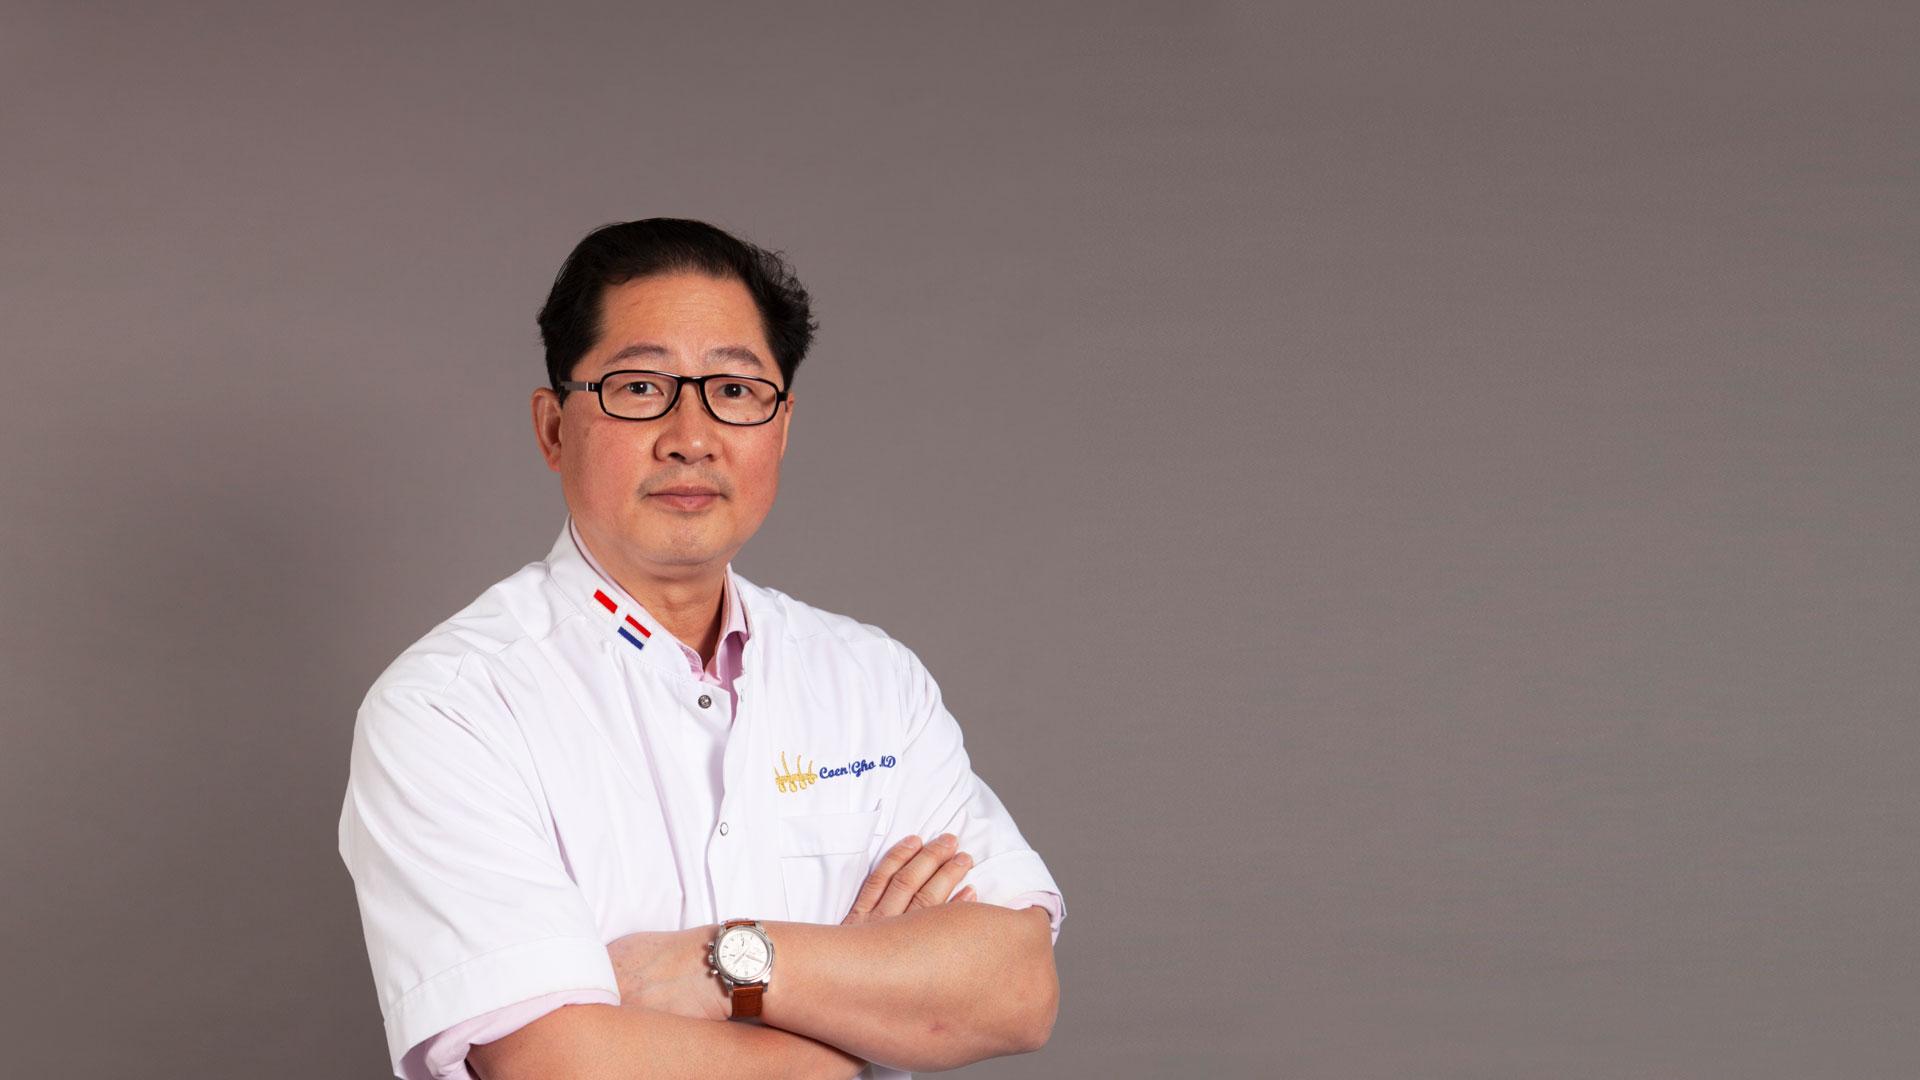 Médicin Dr Coen Gho